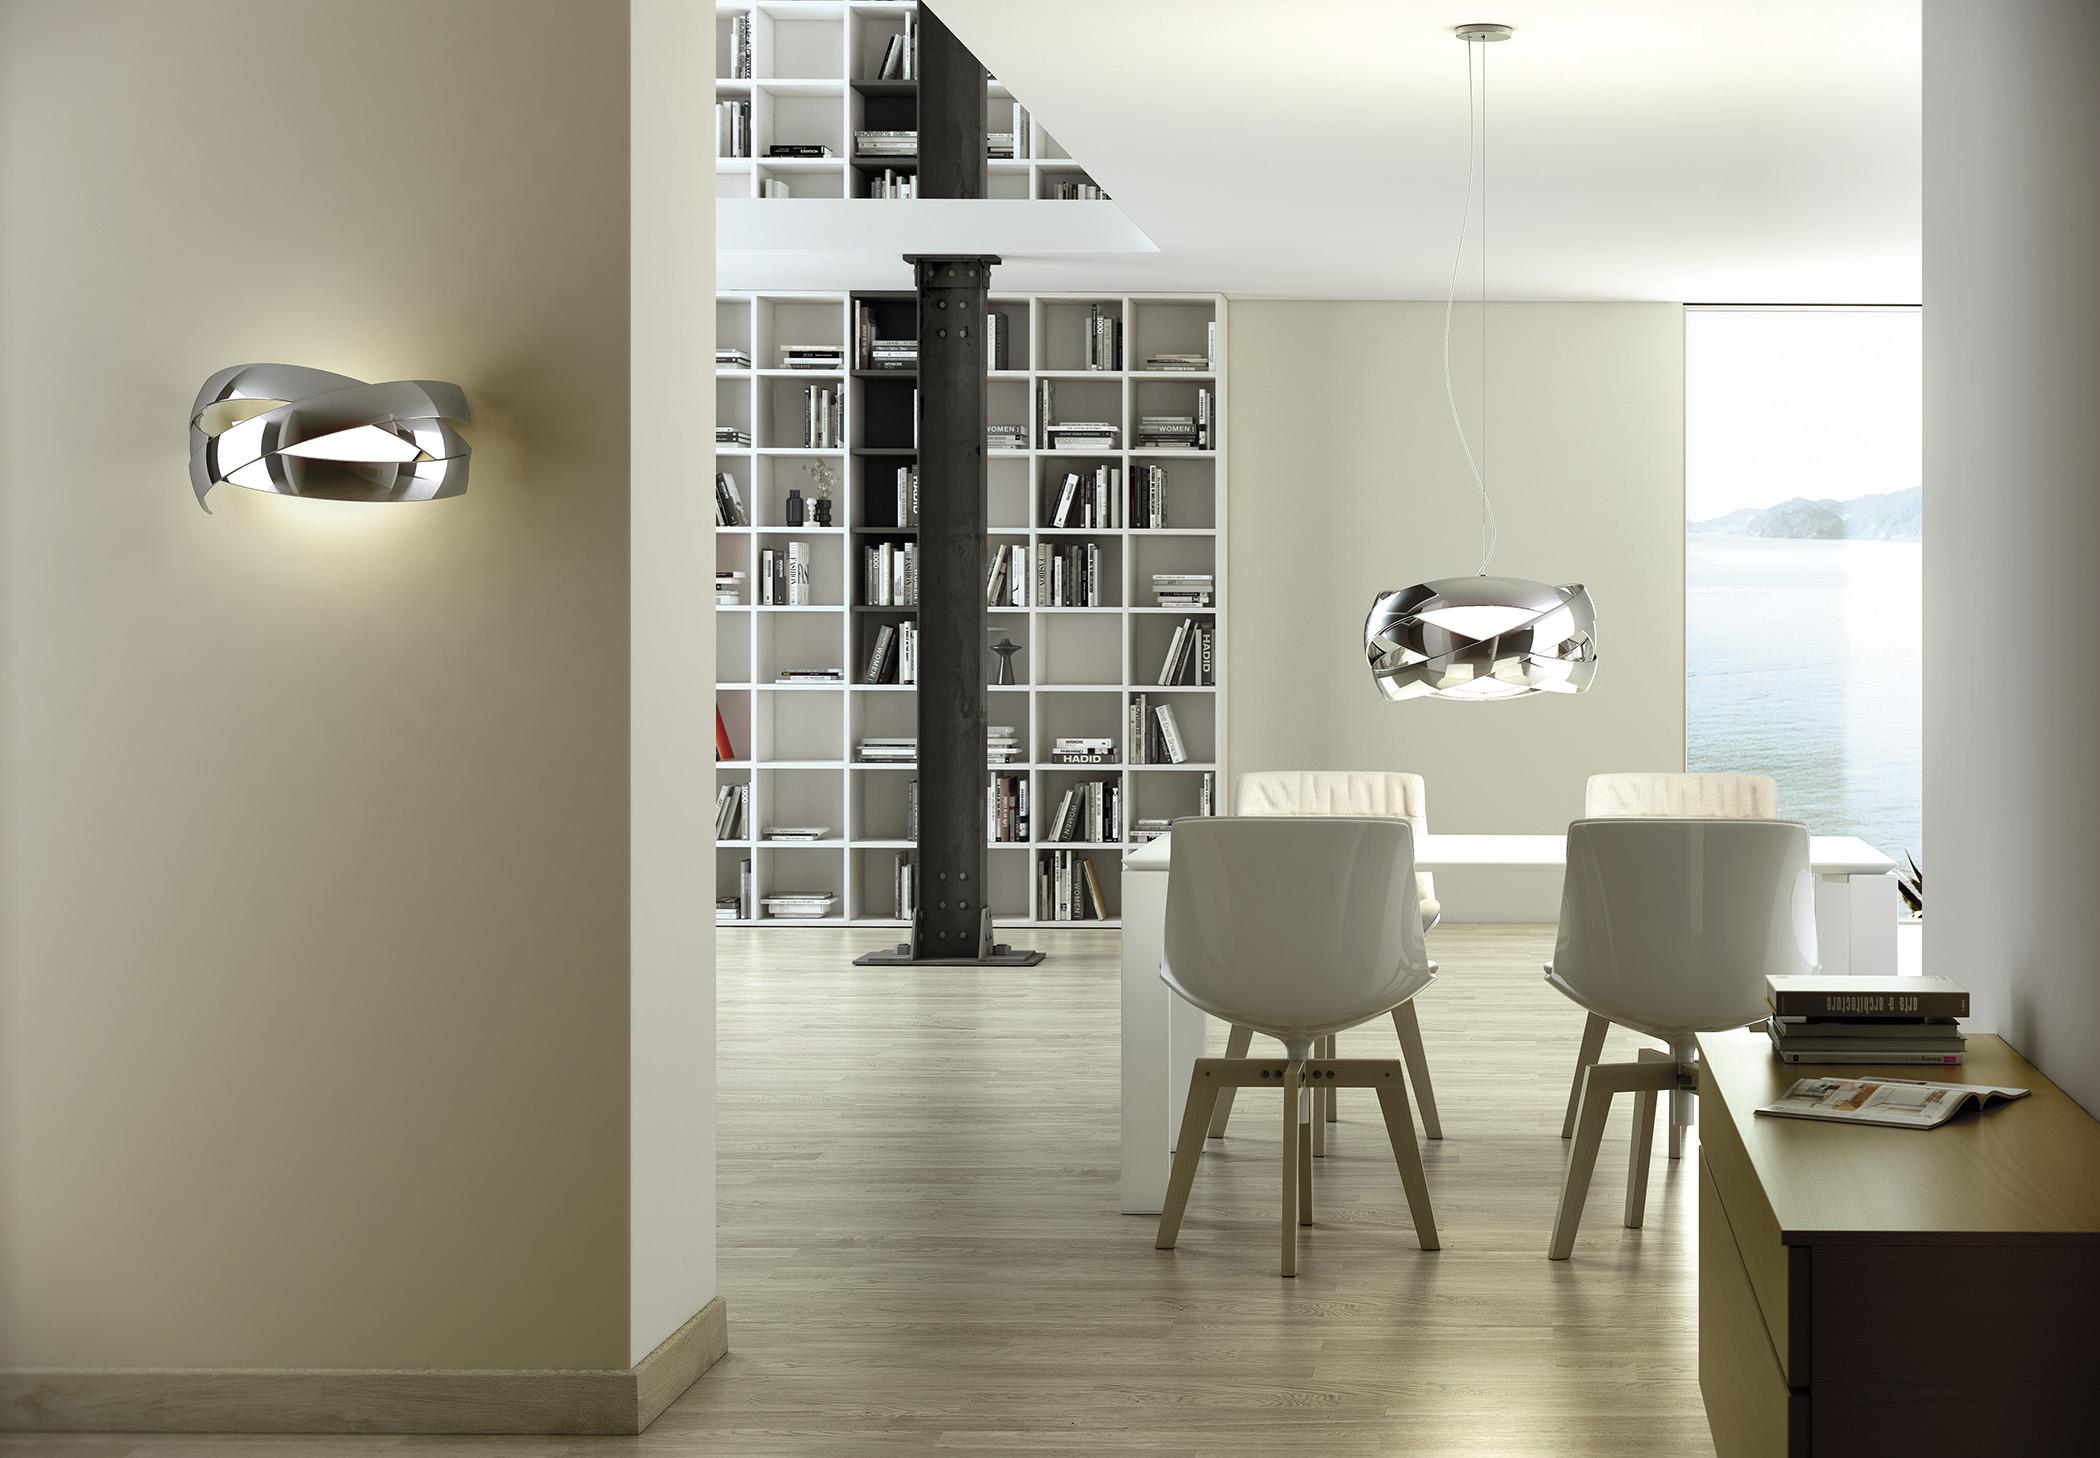 Siso A 2990 Wall Lamp Estiluz Image Ambient 01